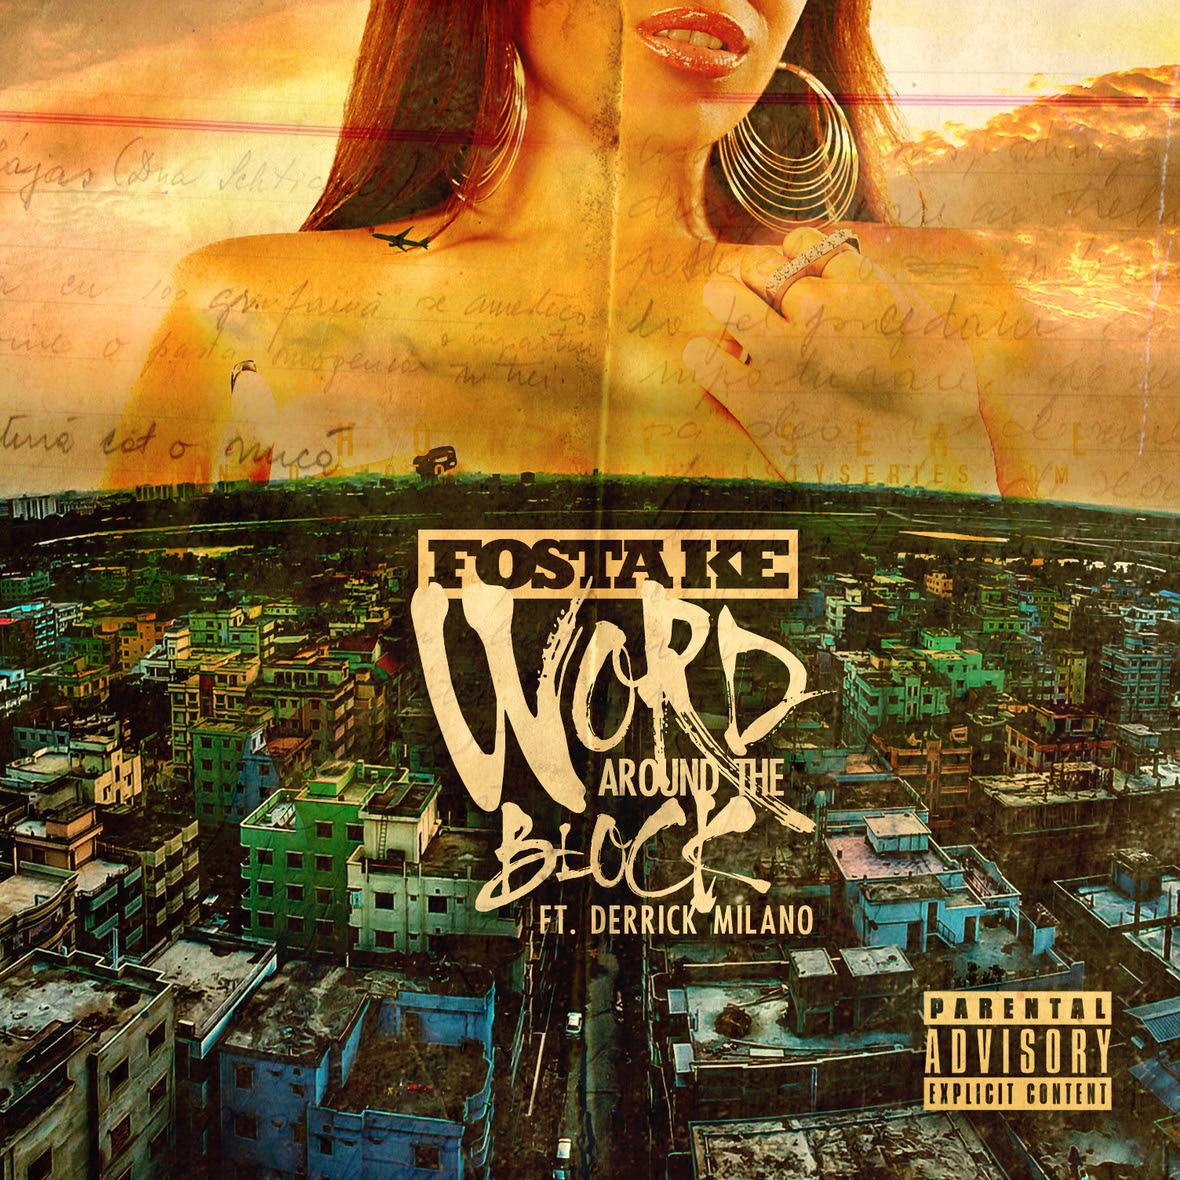 Fosta Ke - Word Around the Block  b